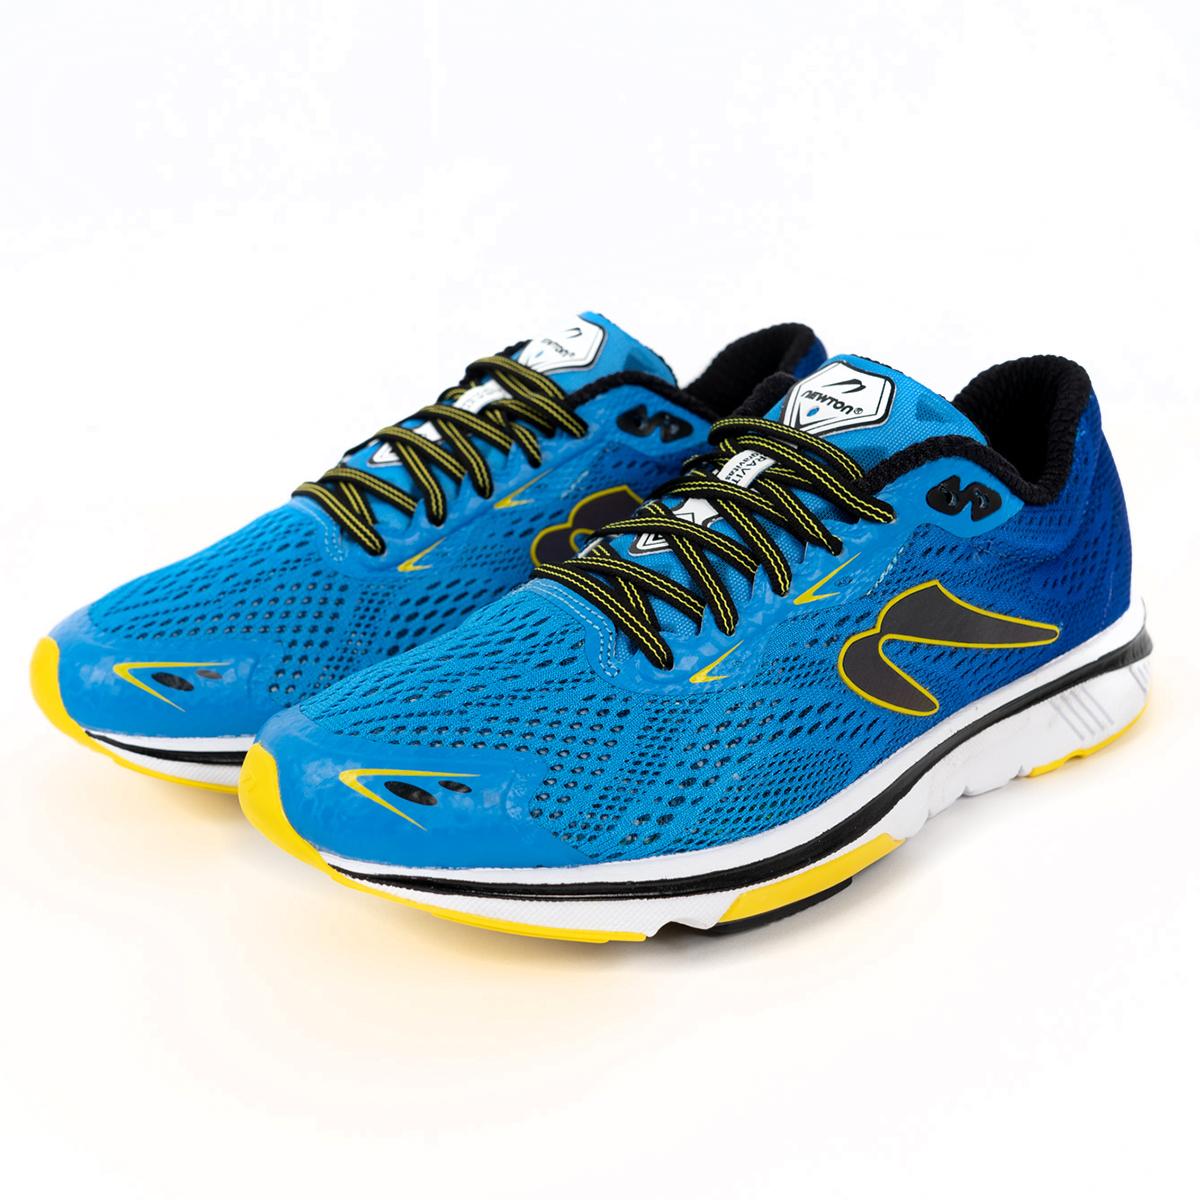 Men's Newton Gravity 9 Running Shoe - Color: Navy/Citron (Regular Width) - Size: 6, Navy/Citron, large, image 3